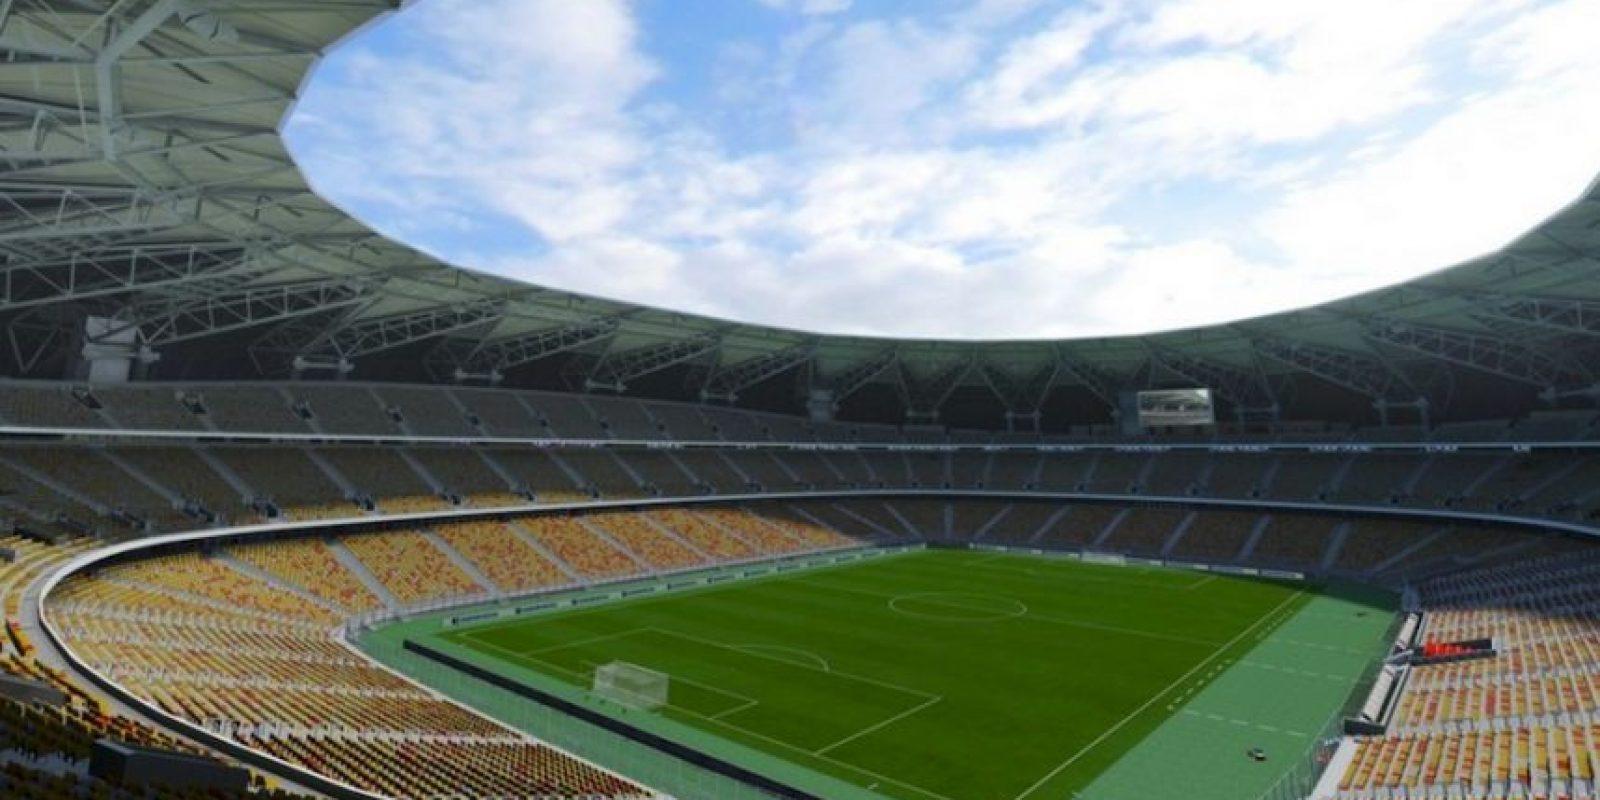 King Abdullah Sports City (Al-Ittihad y Al-Ahli, Abdul Latif Jameel League de Arabia Saudita) Foto:EA Sports